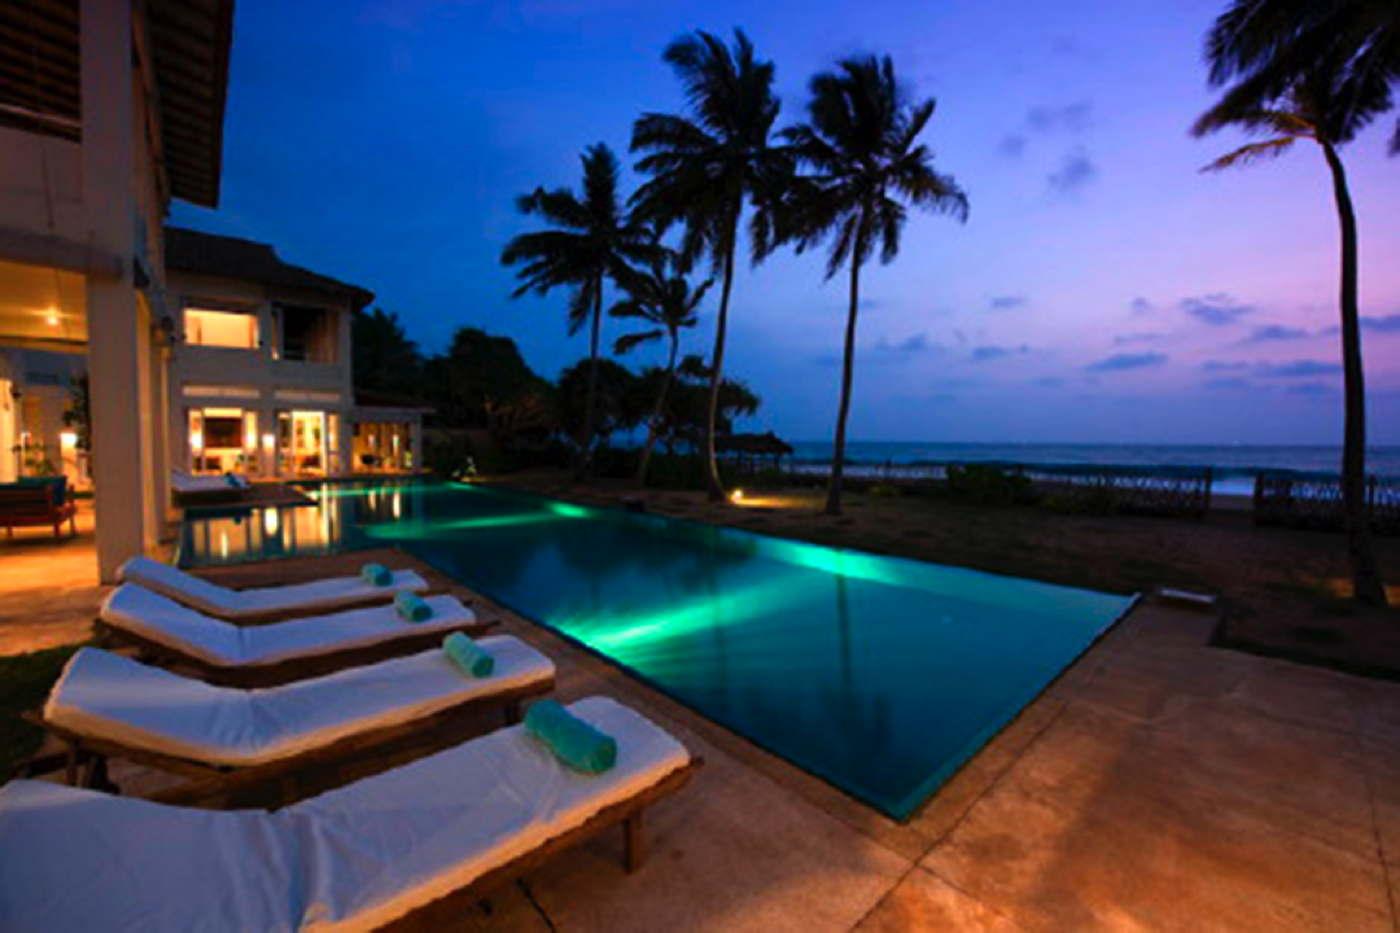 Ferienhaus am Strand mieten Ferienvilla am Meer mit Pool